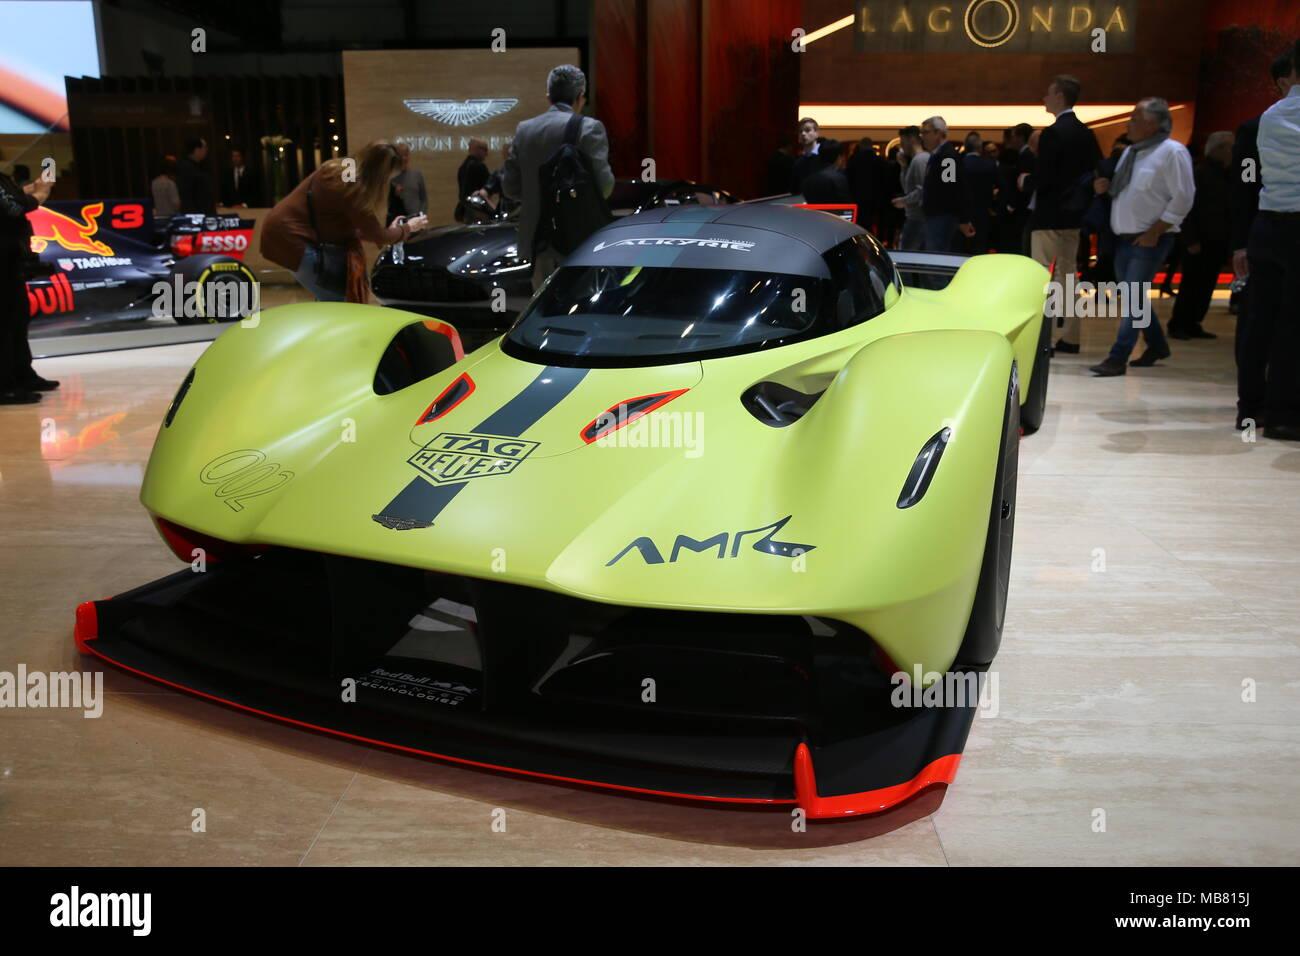 The Cars Of The Geneva International Motor Show Featuring Aston